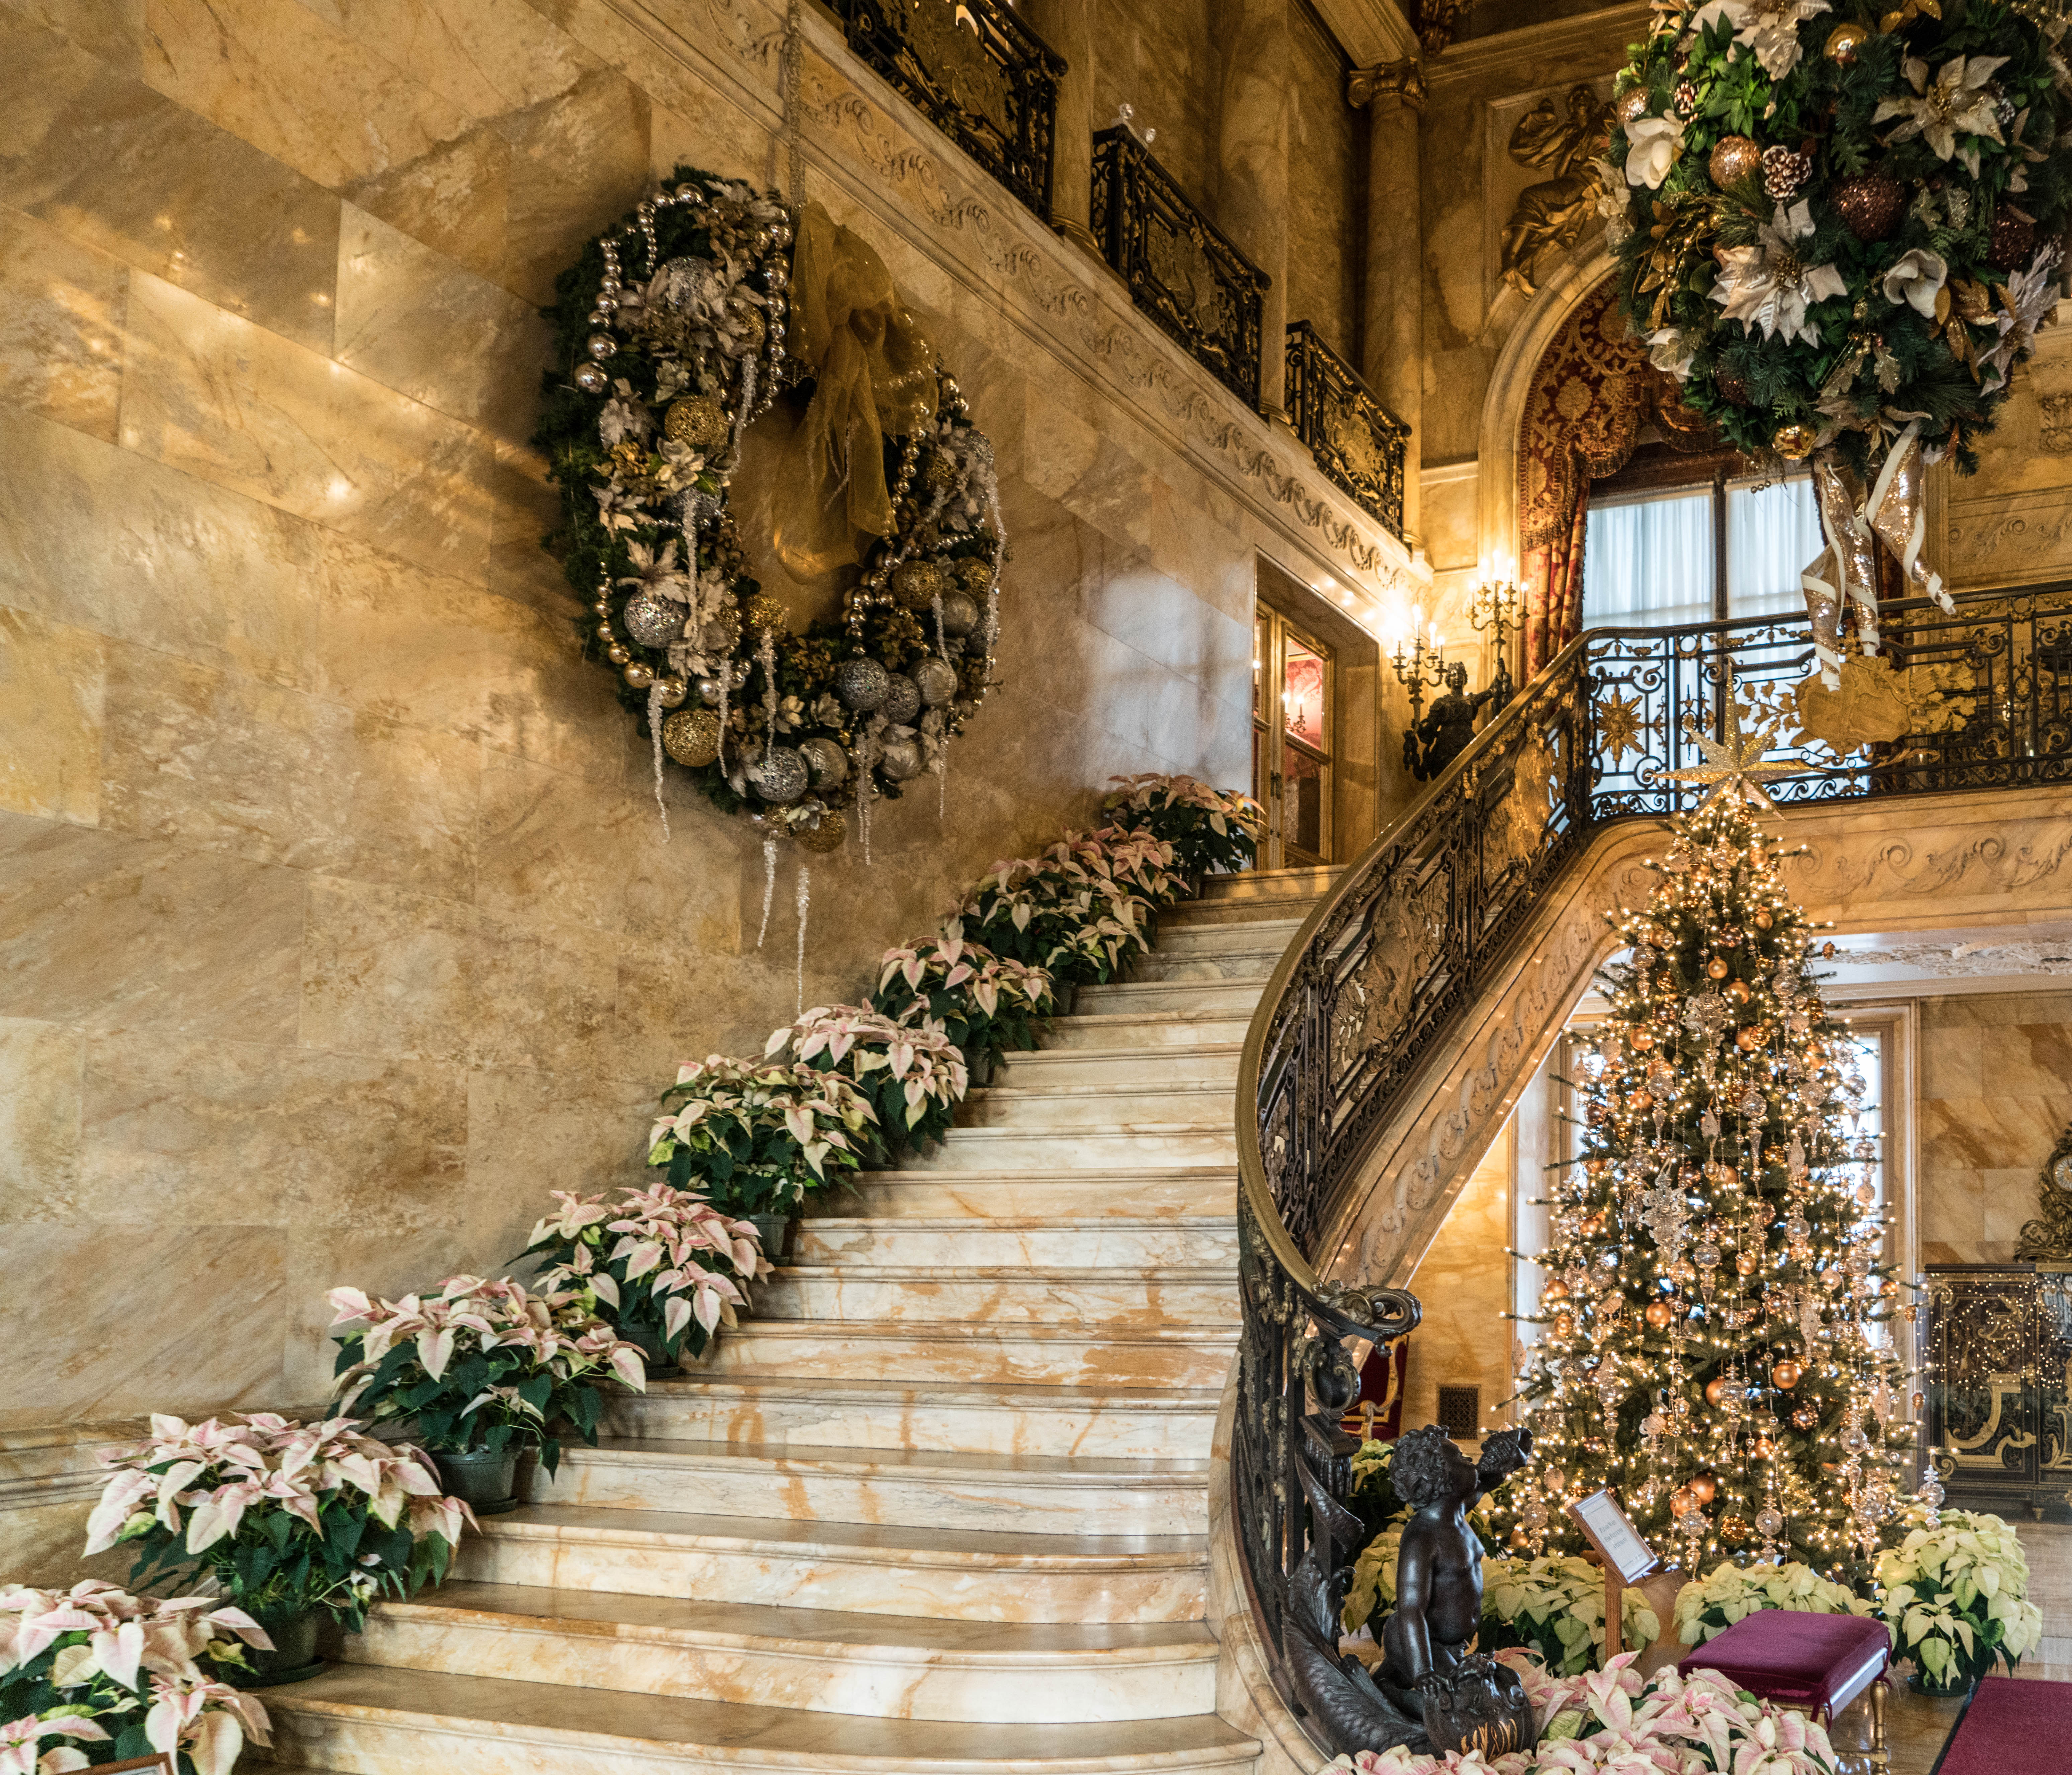 #Marblehouse, #Newport, #rhodeisland, #mansions, #Christmas, #gildedage, #stairs, #Vanderbilt